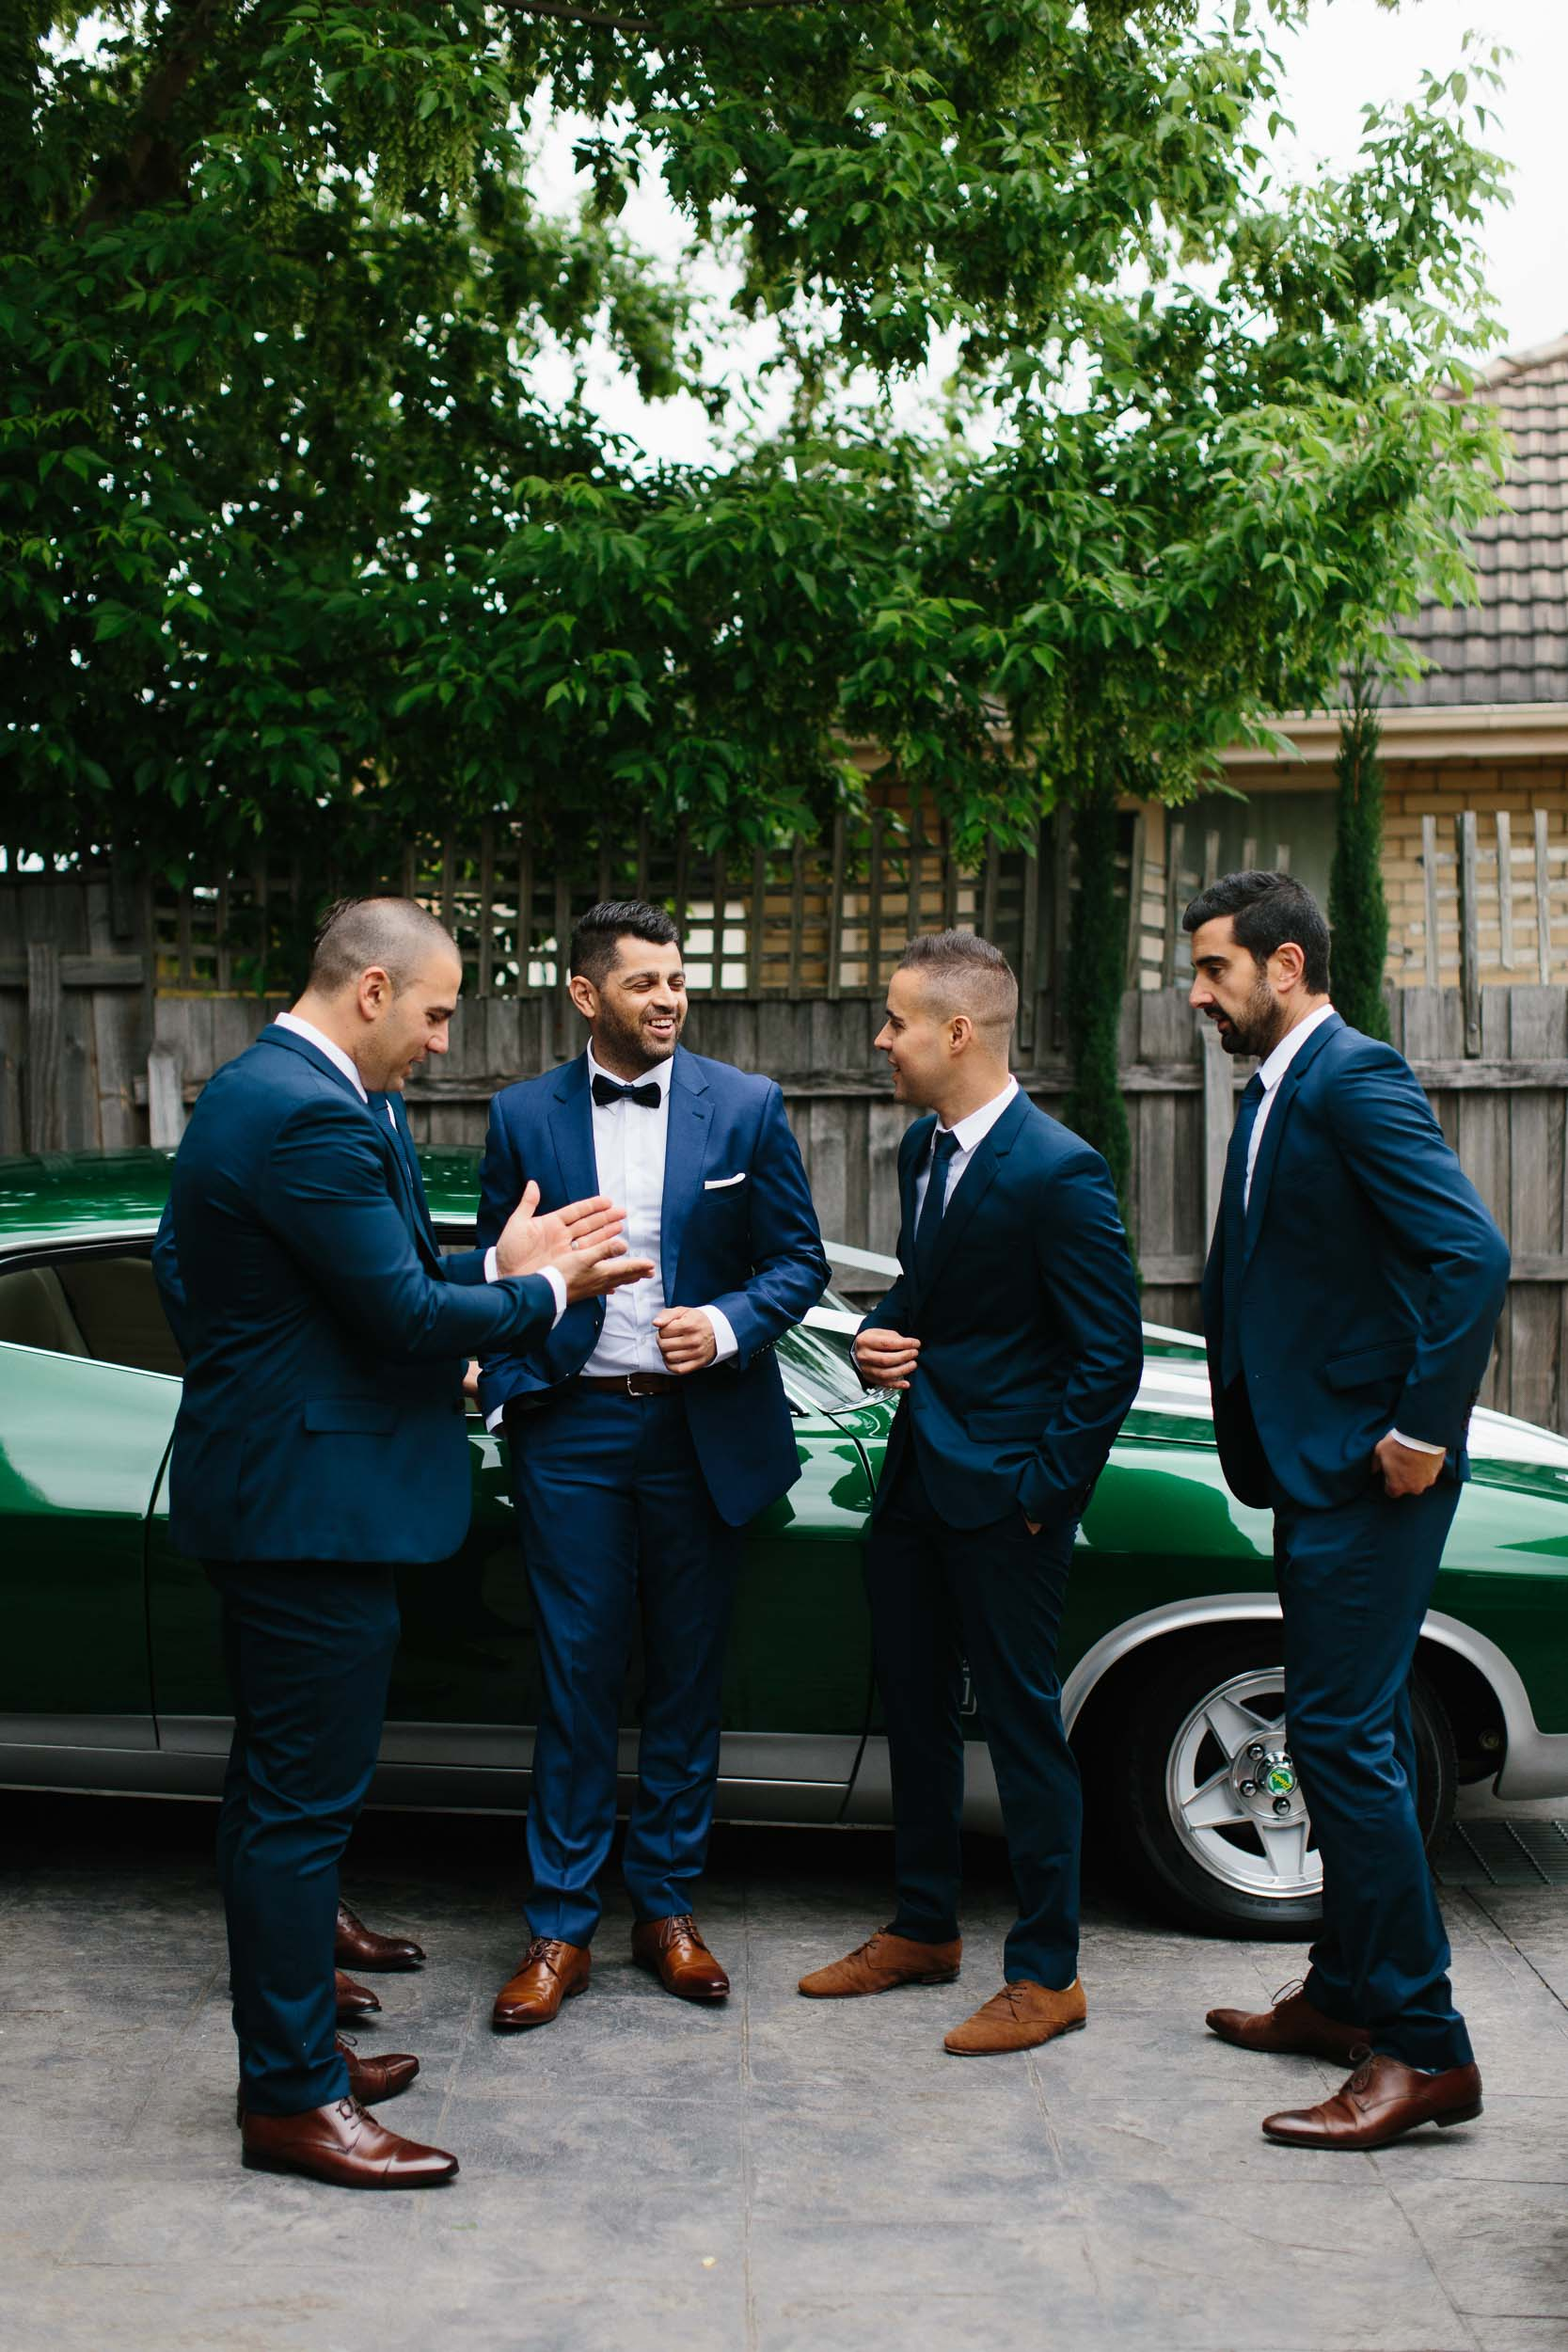 Kas-Richards-Urban-Melbourne-Wedding-Jason-Grech-2.jpg